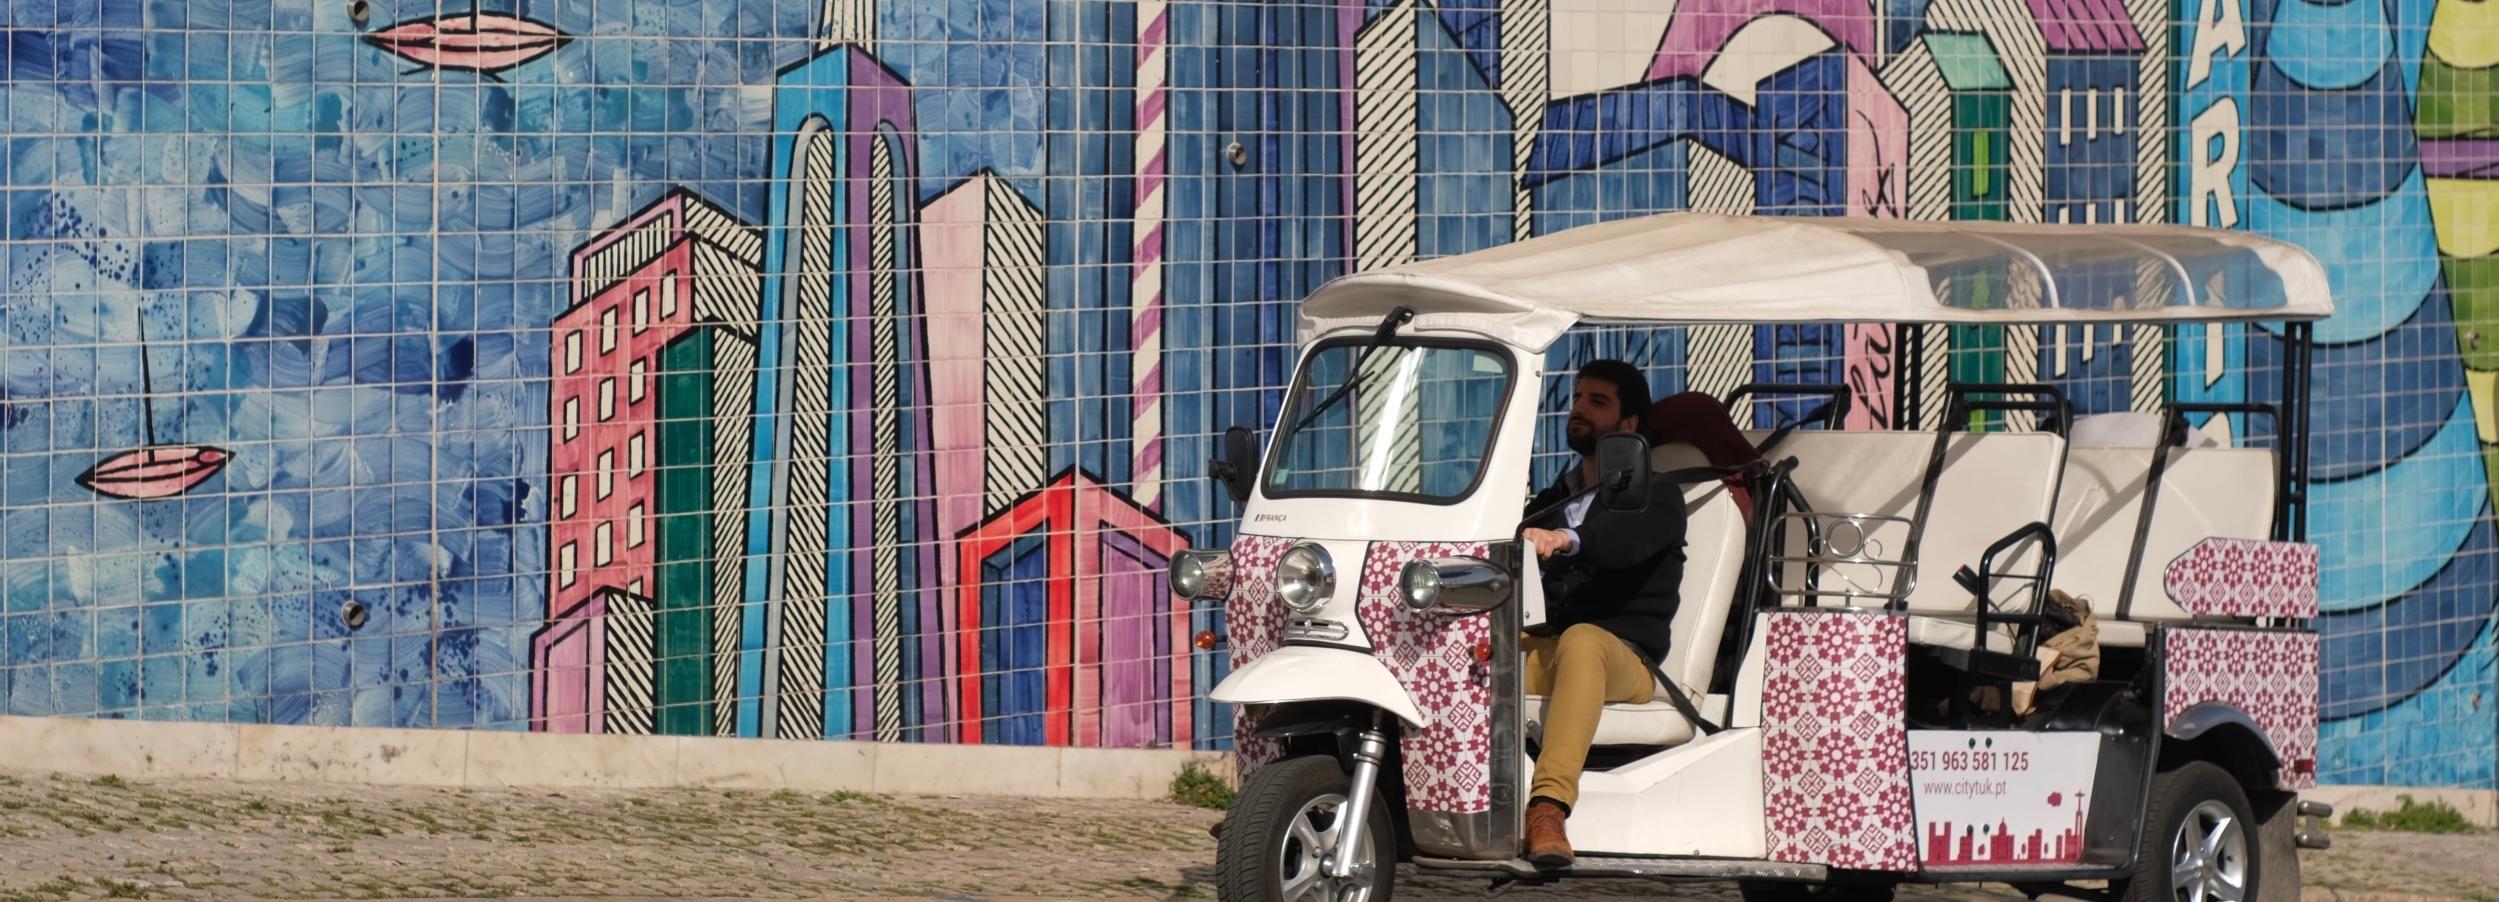 Lisboa: Excursão Turística de 3 Horas de Tuk Tuk